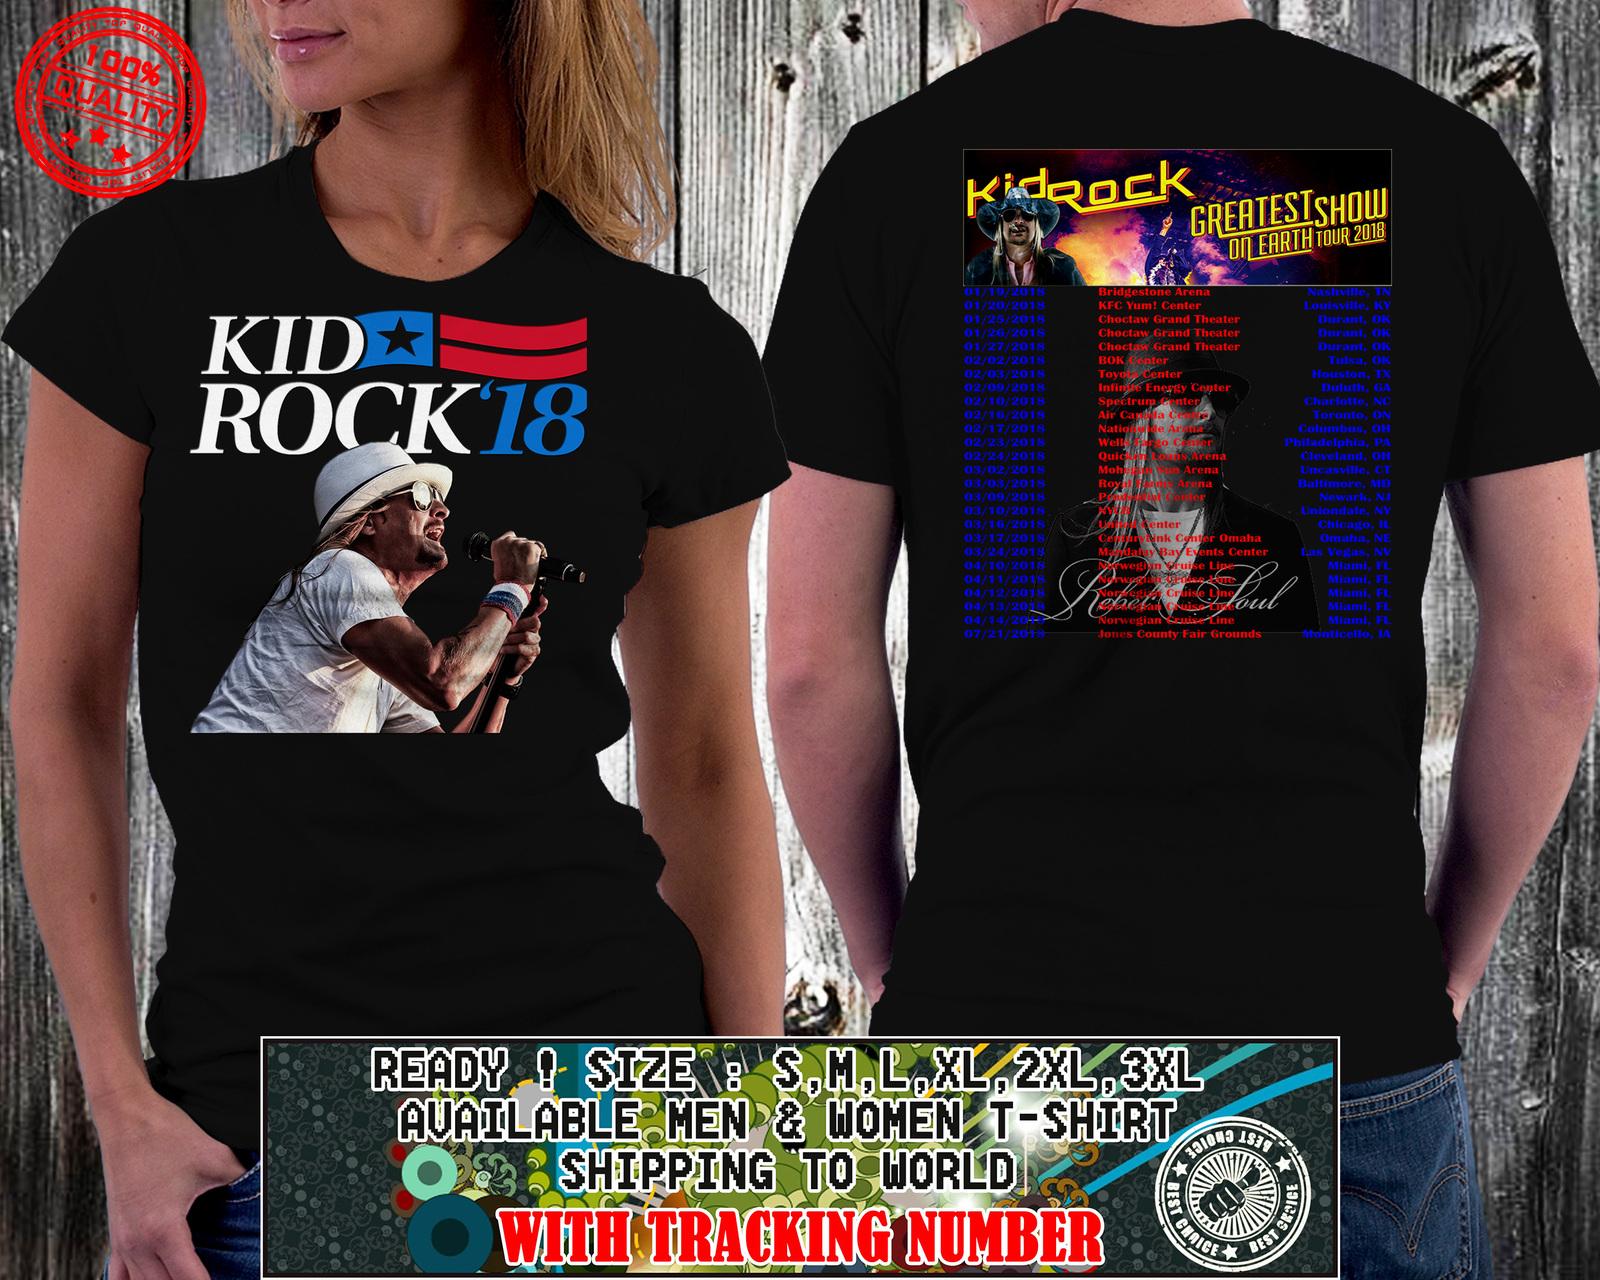 ae393e0bcce Kid Rock Concert T Shirts 2018 - Joe Maloy